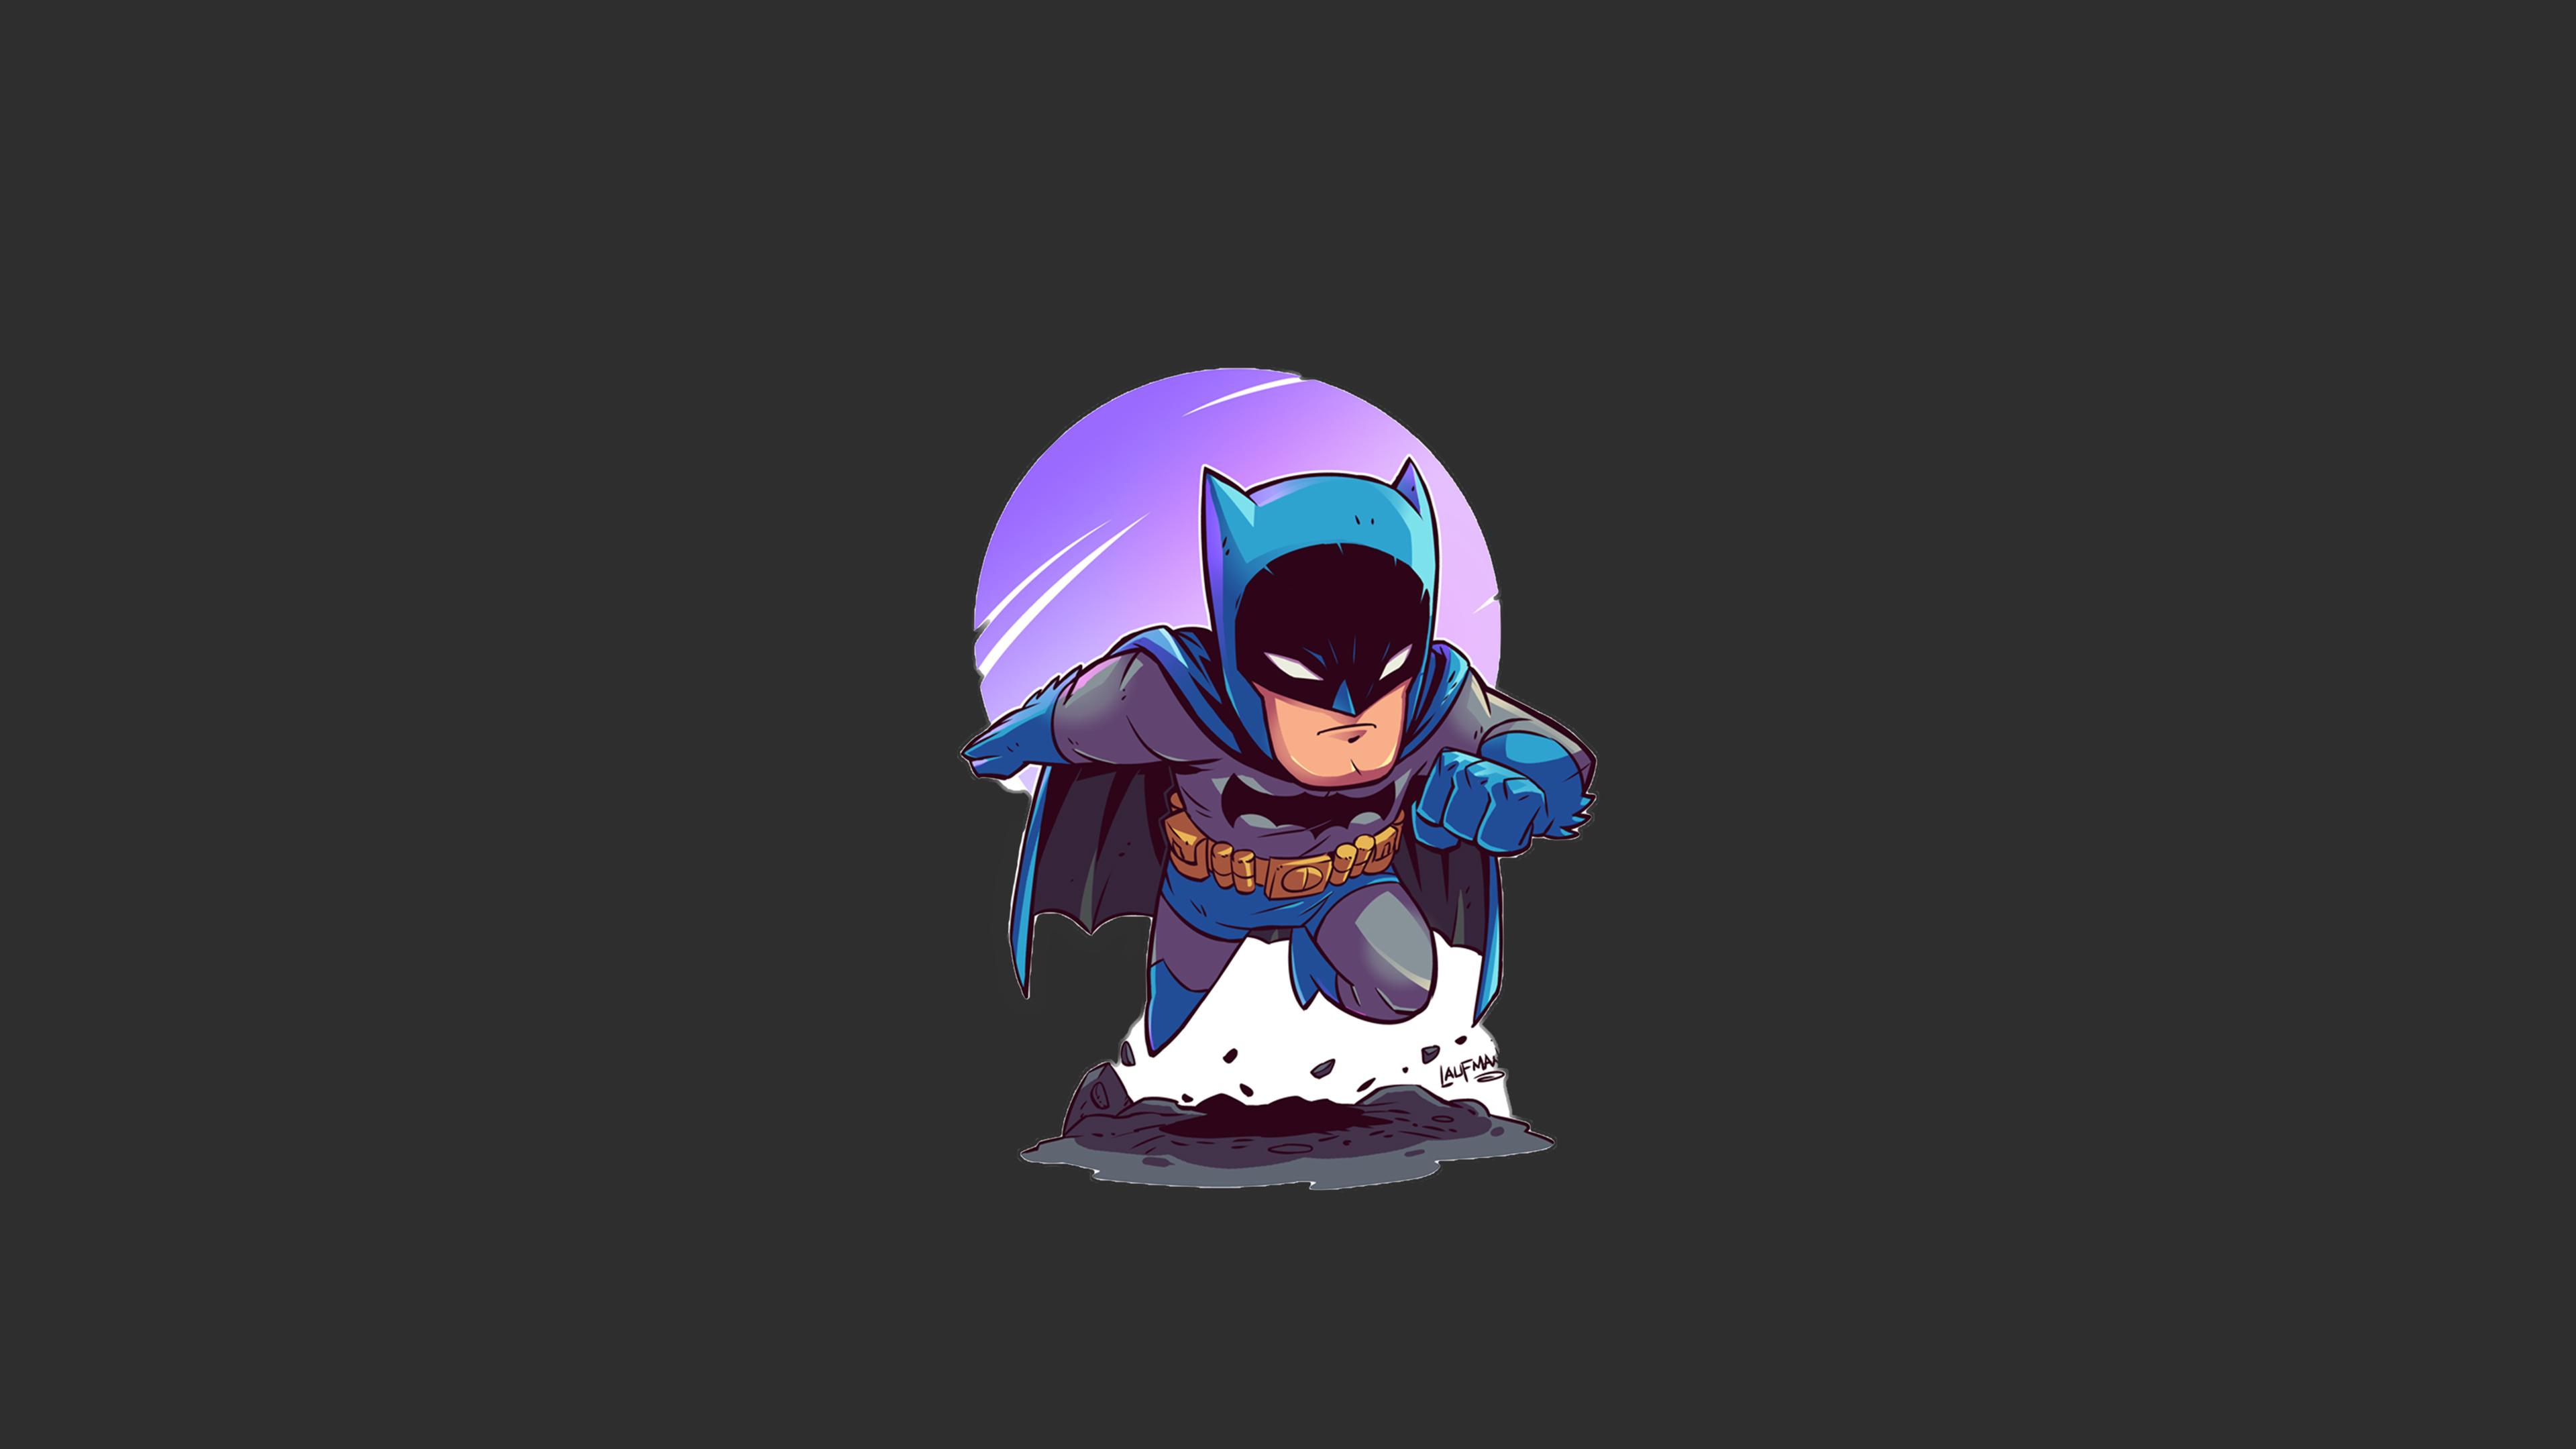 Batman Minimalist Hd Superheroes 4k Wallpapers Images